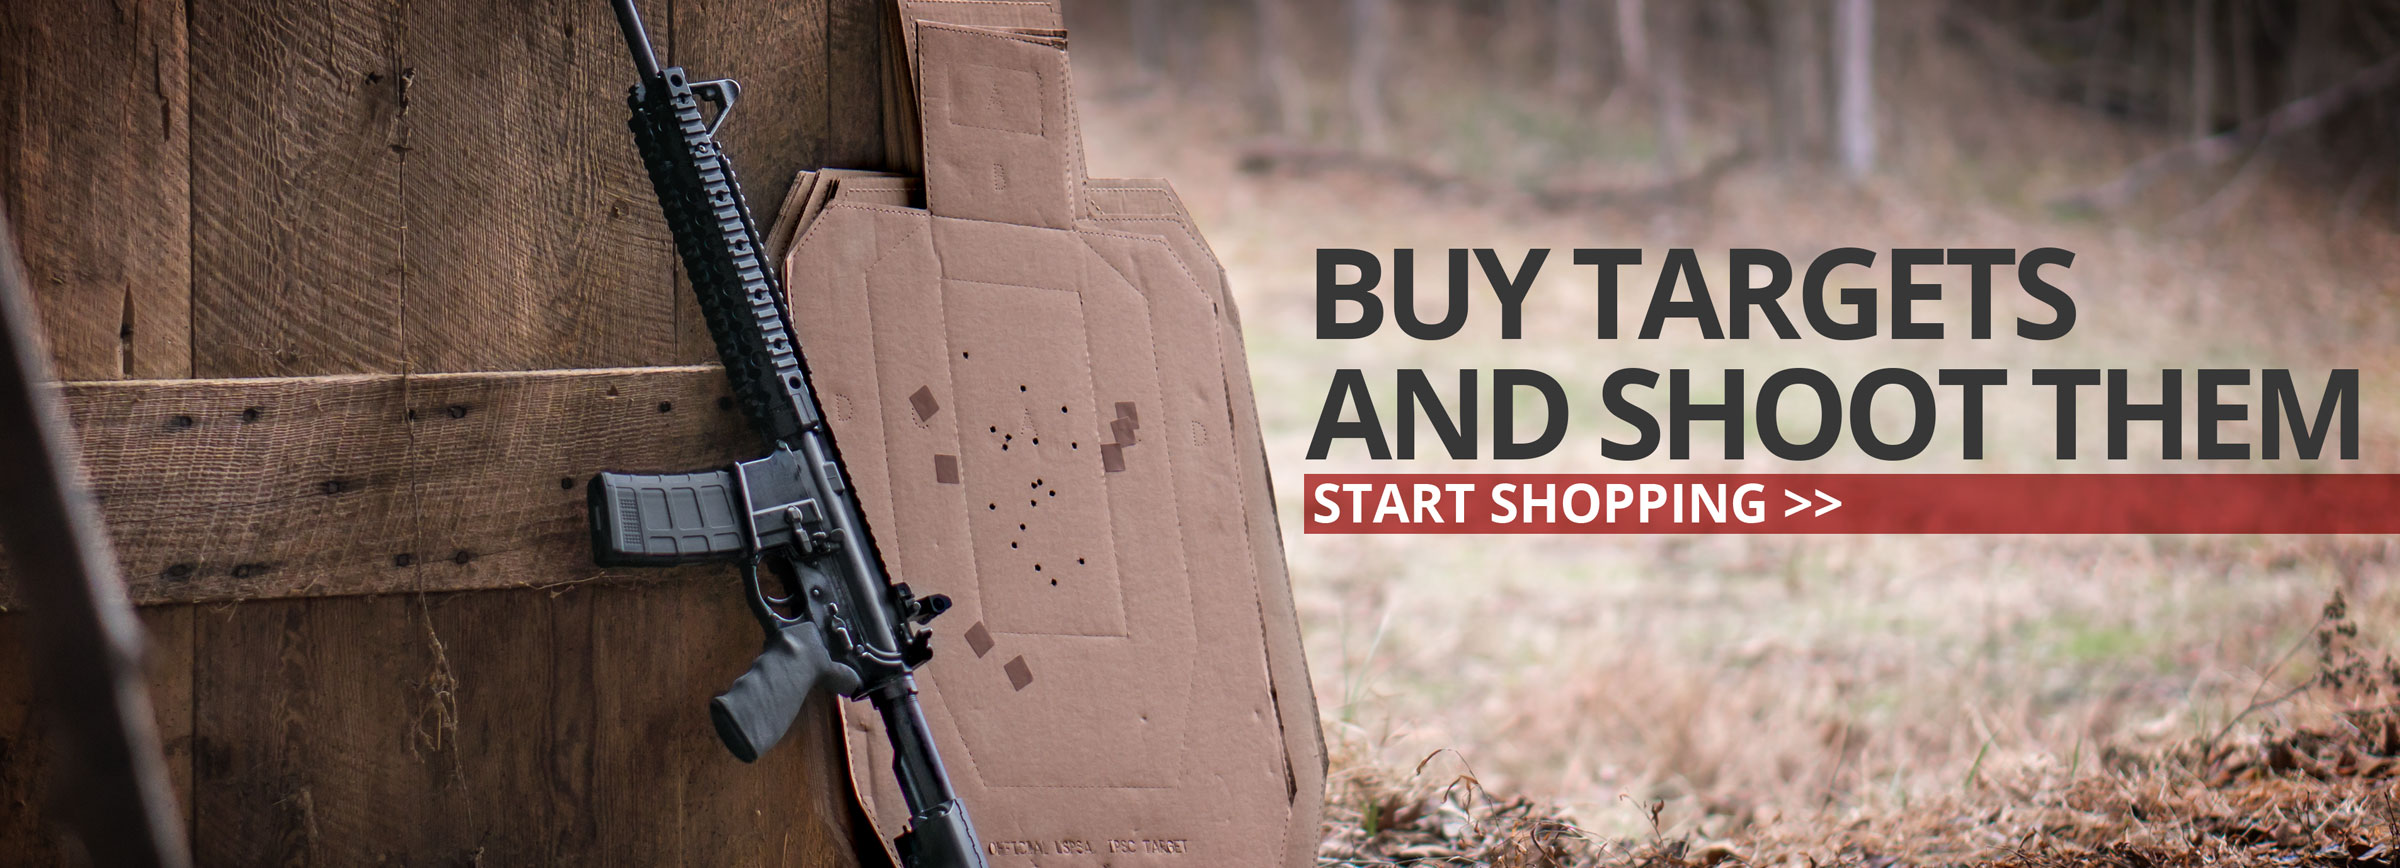 Buy targets and start shooting